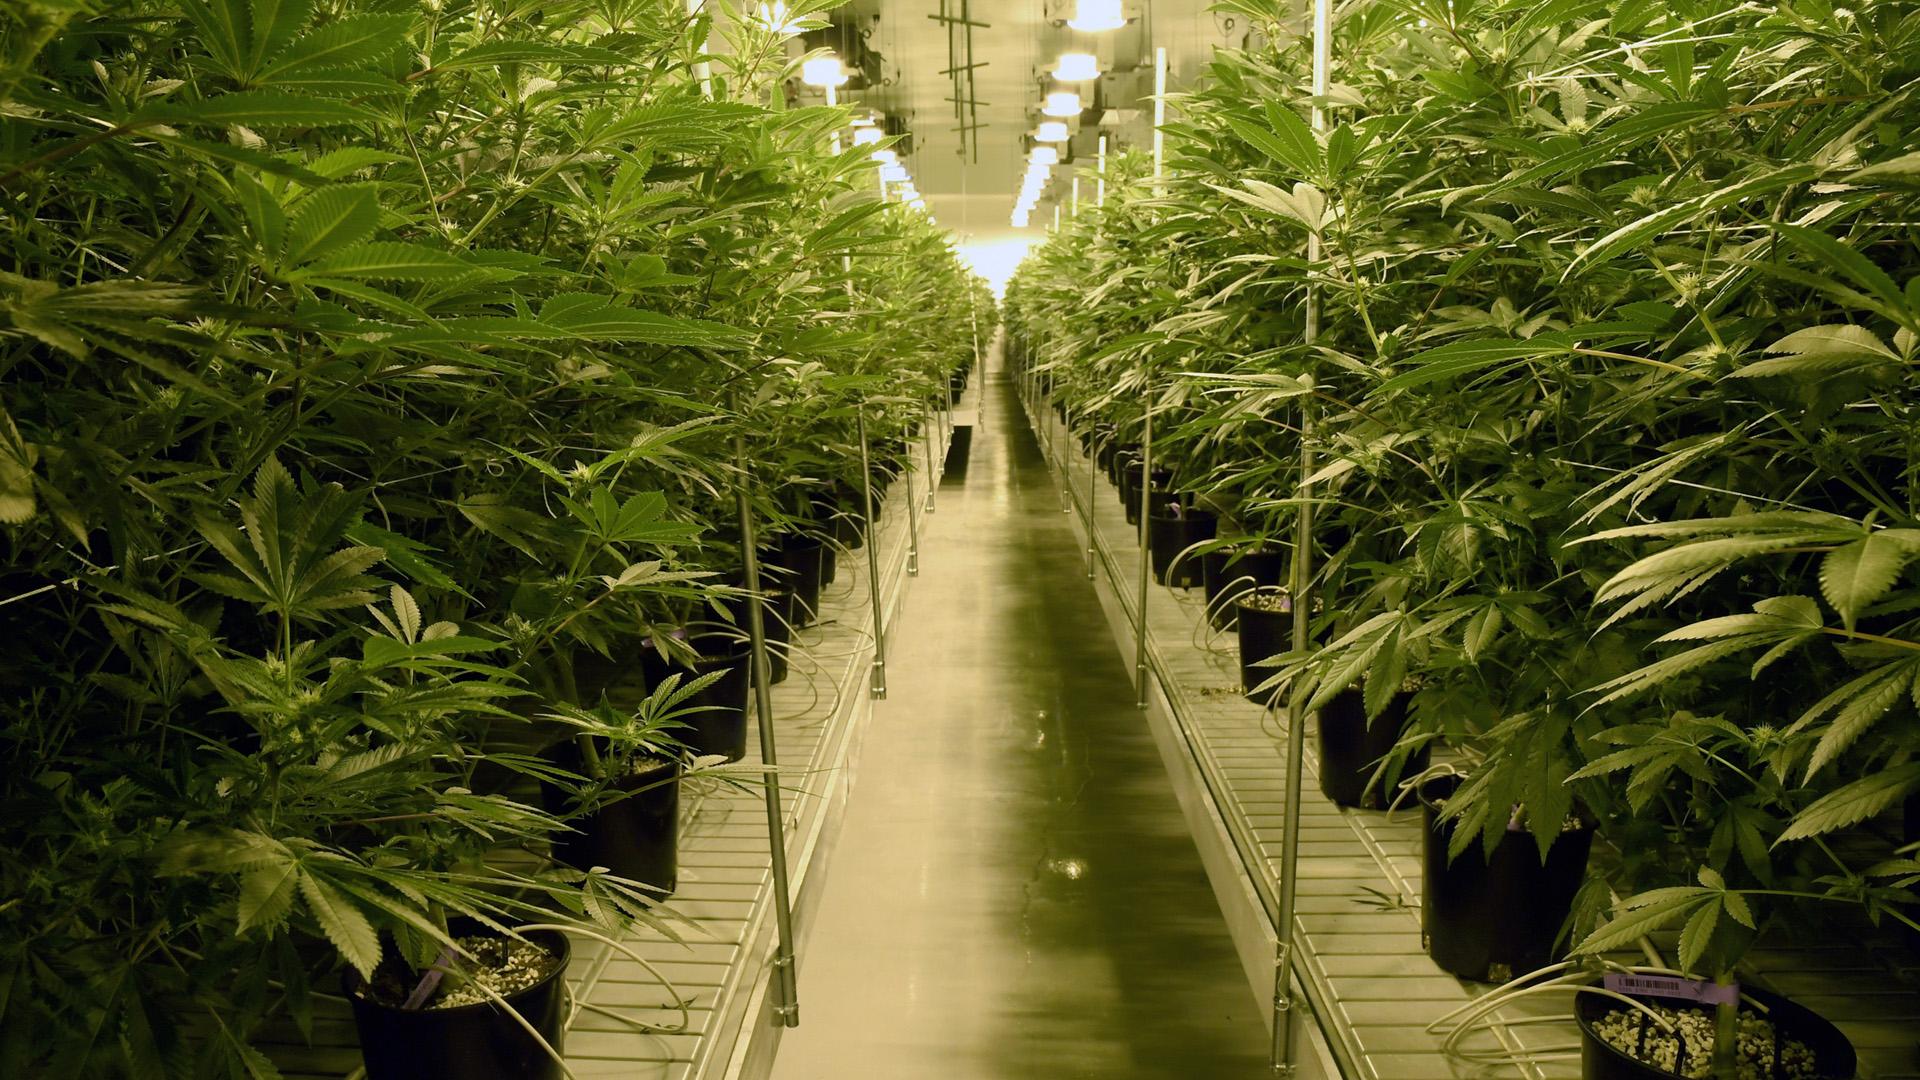 Marijuana plants, pot, cultivation facility in Las Vegas, Nevada82801722-159532